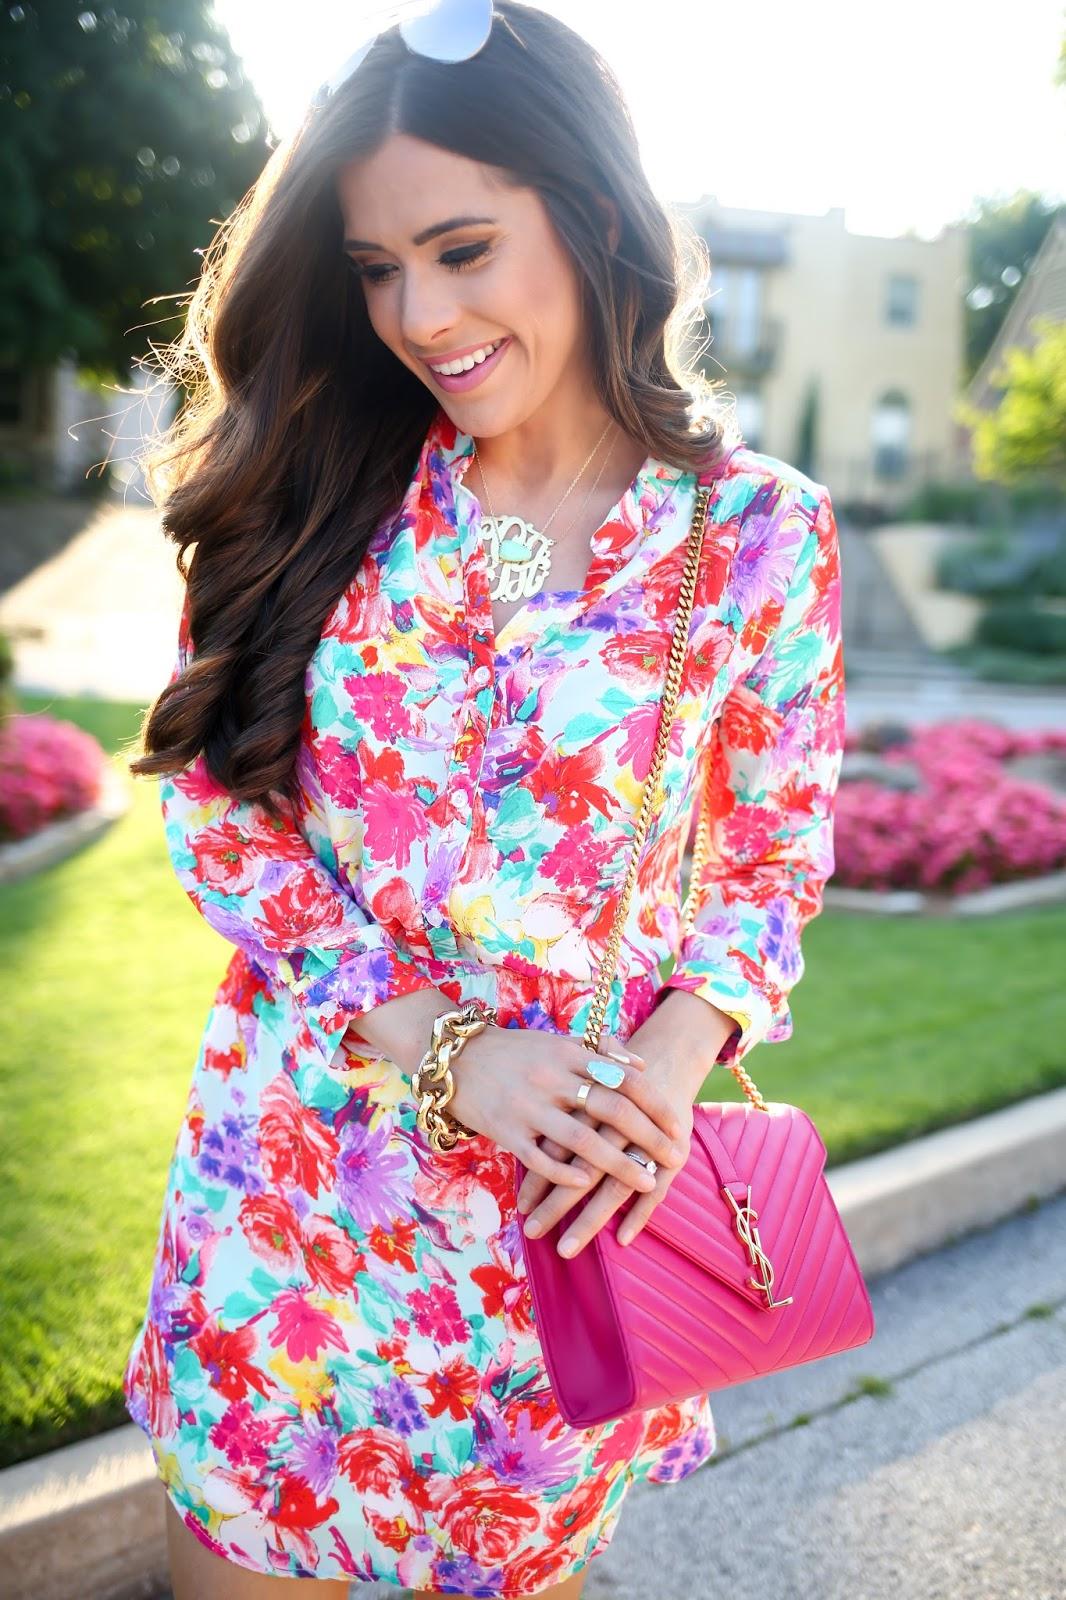 yves saint laurent handbags - ysl bags pink